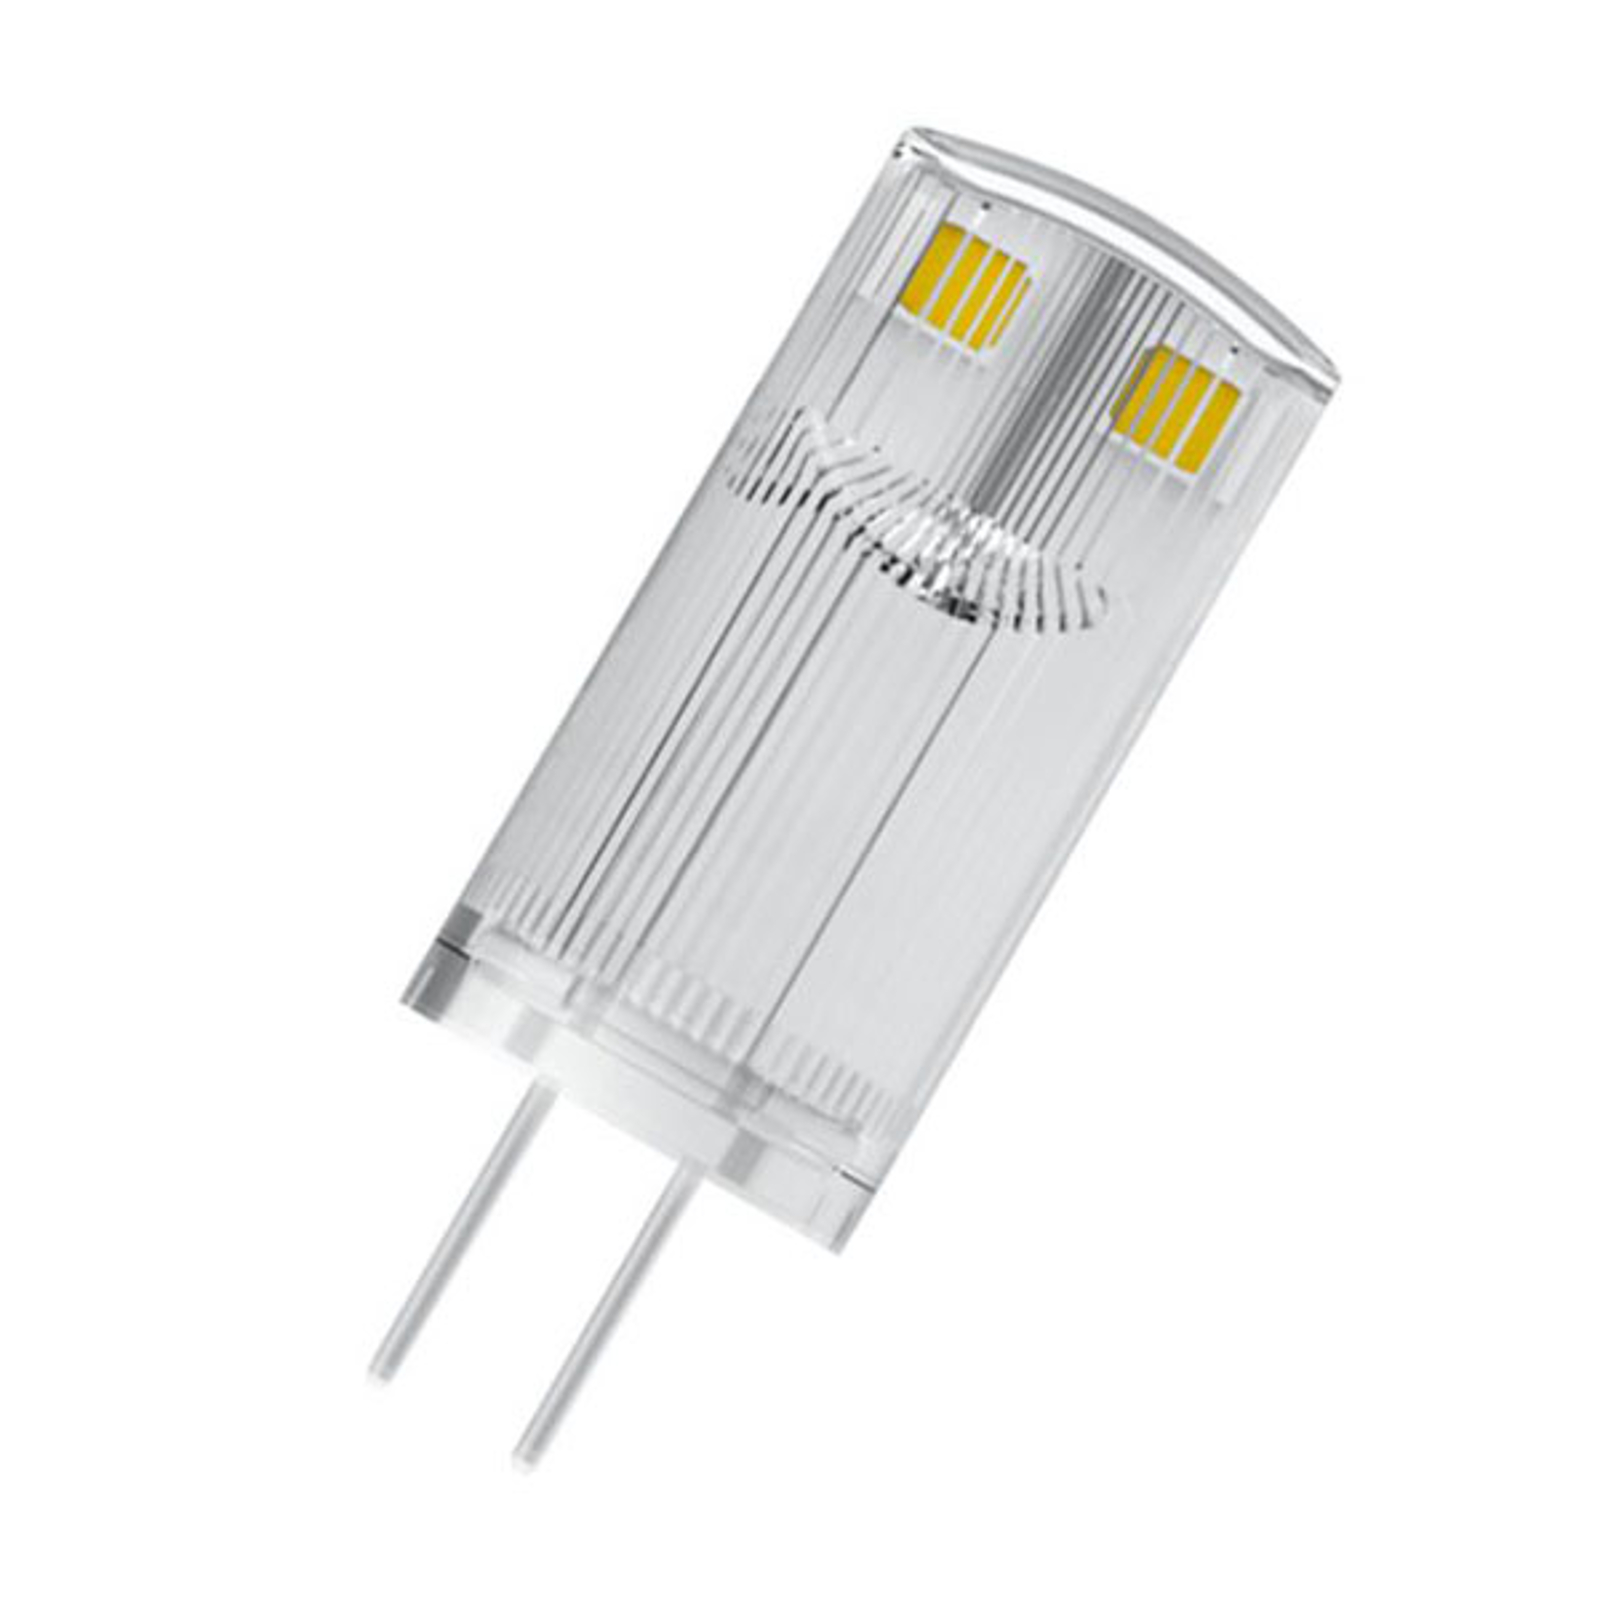 OSRAM LED-Stiftsockellampe G4 0,9W 2.700K klar